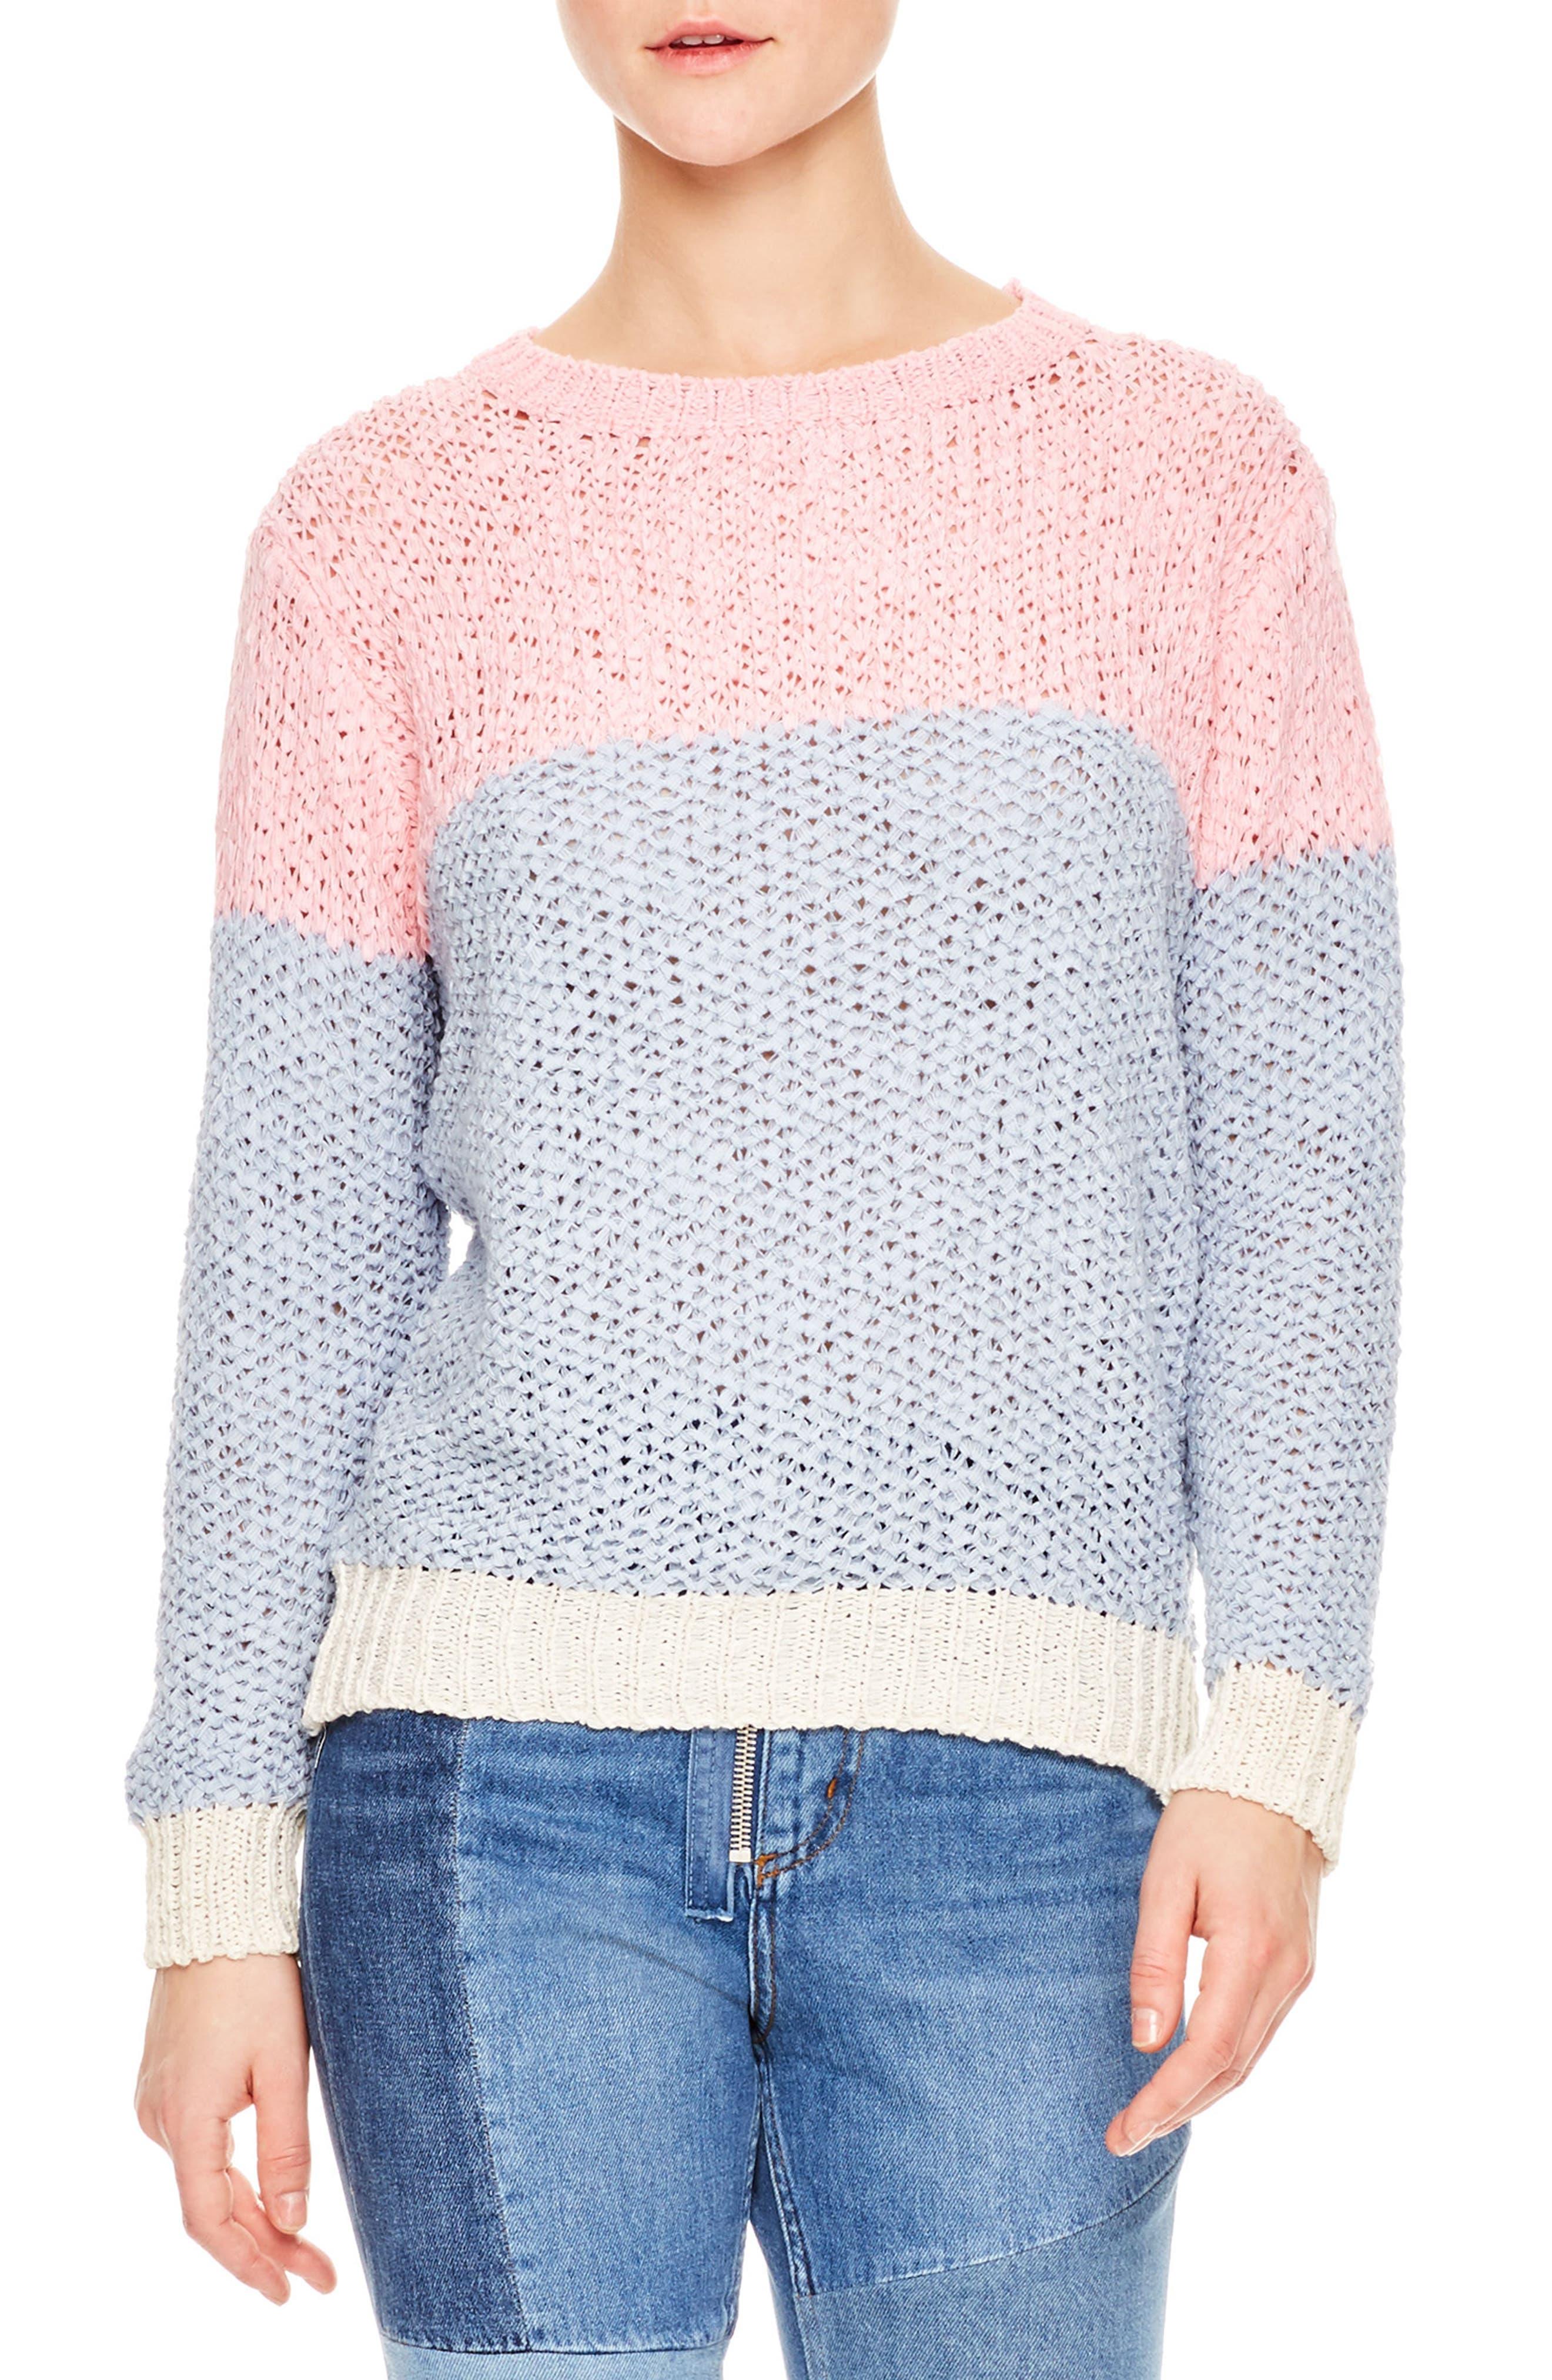 Malabar Colorblock Knit Sweater,                         Main,                         color,